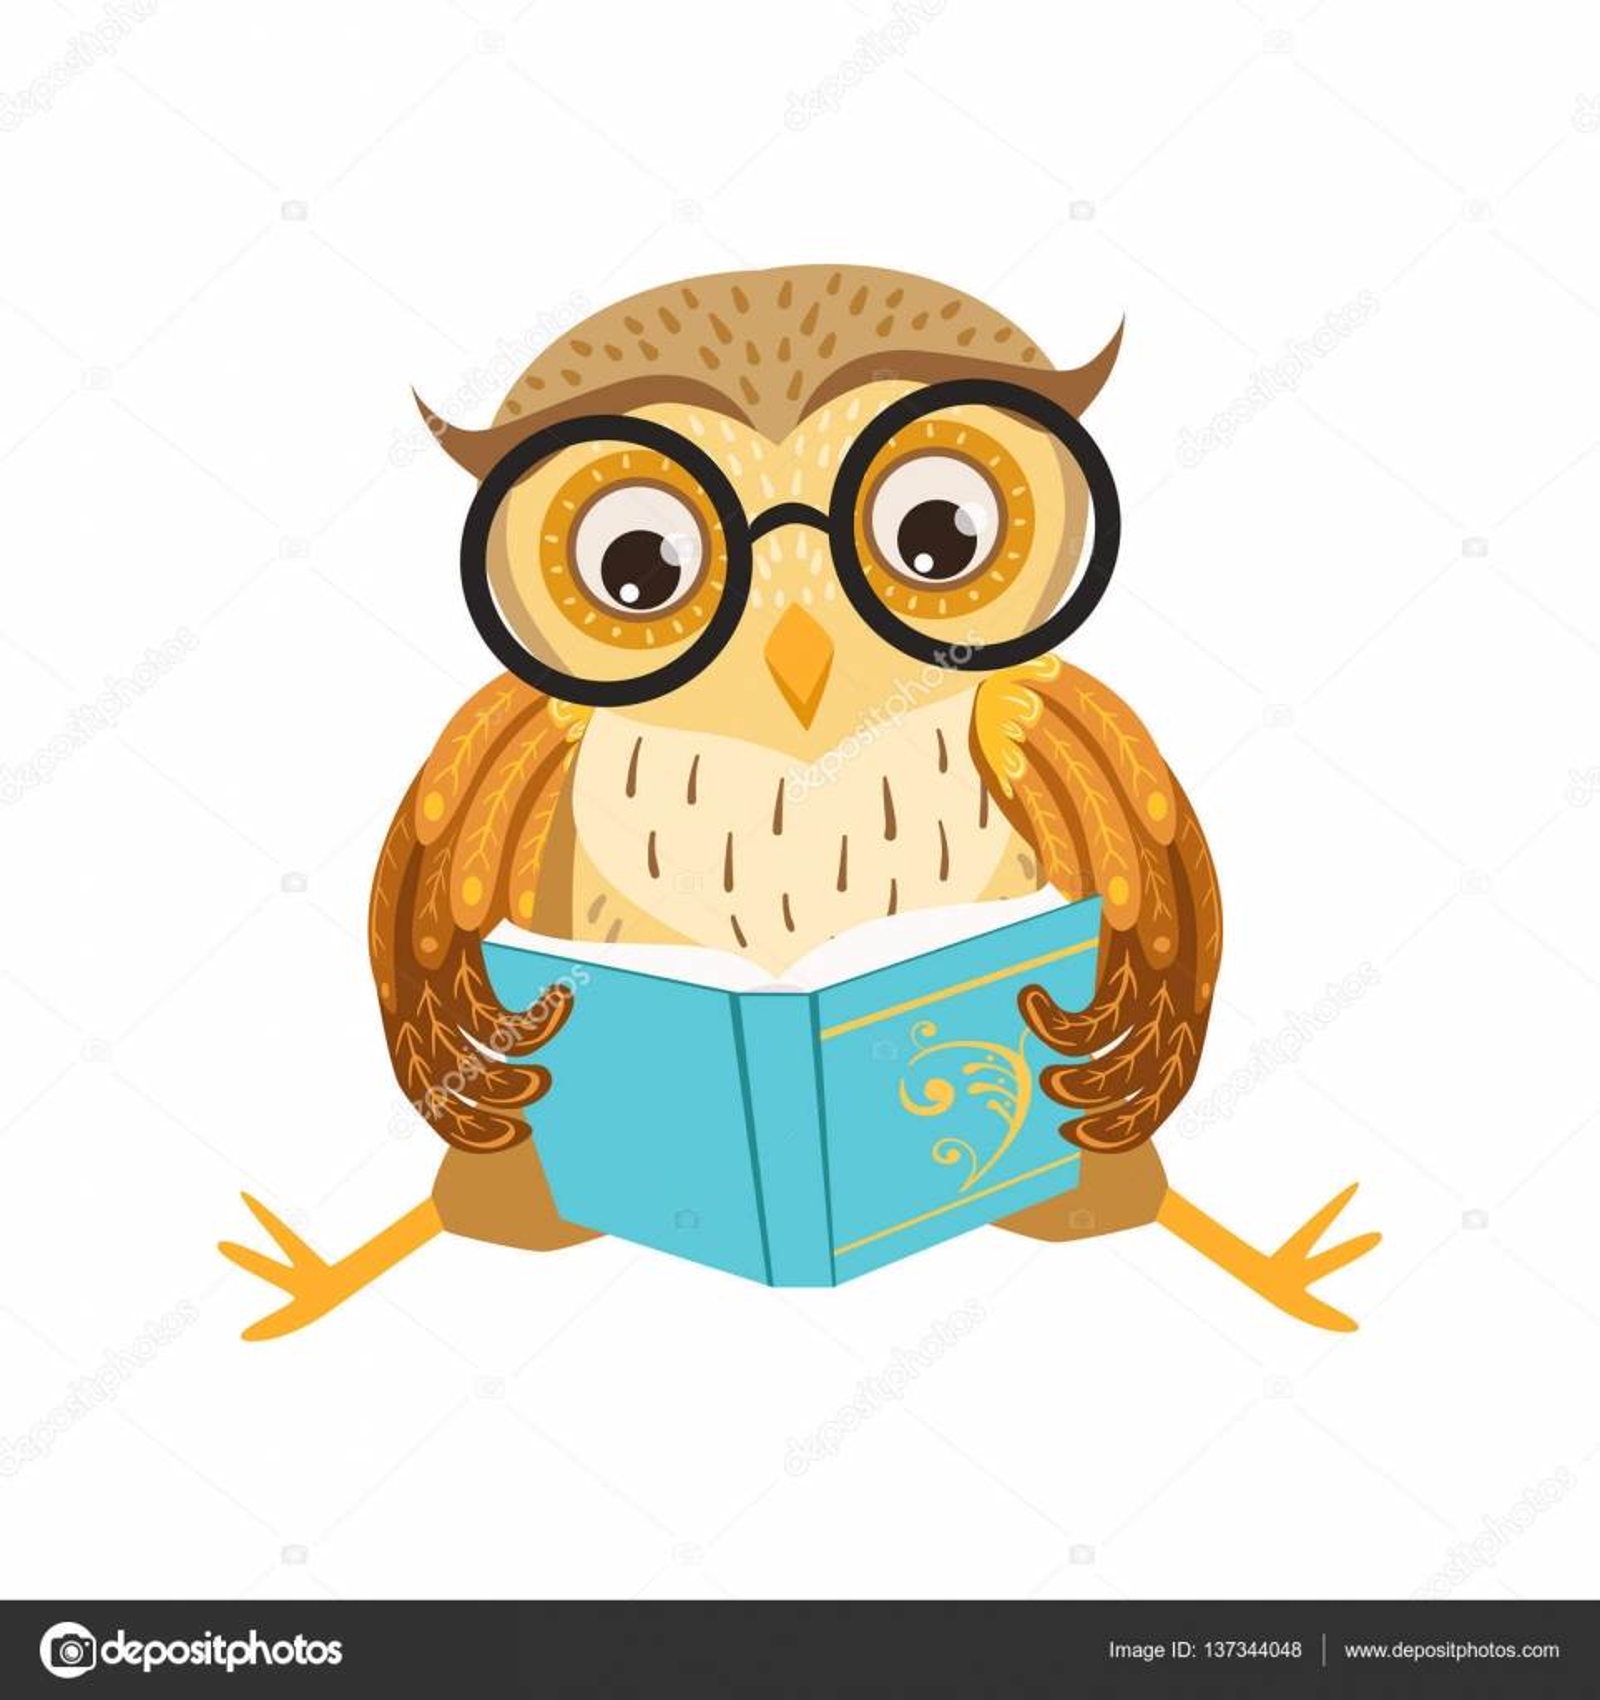 Chouette Lecture Le Livre Cute Cartoon Caractere Emoji Avec